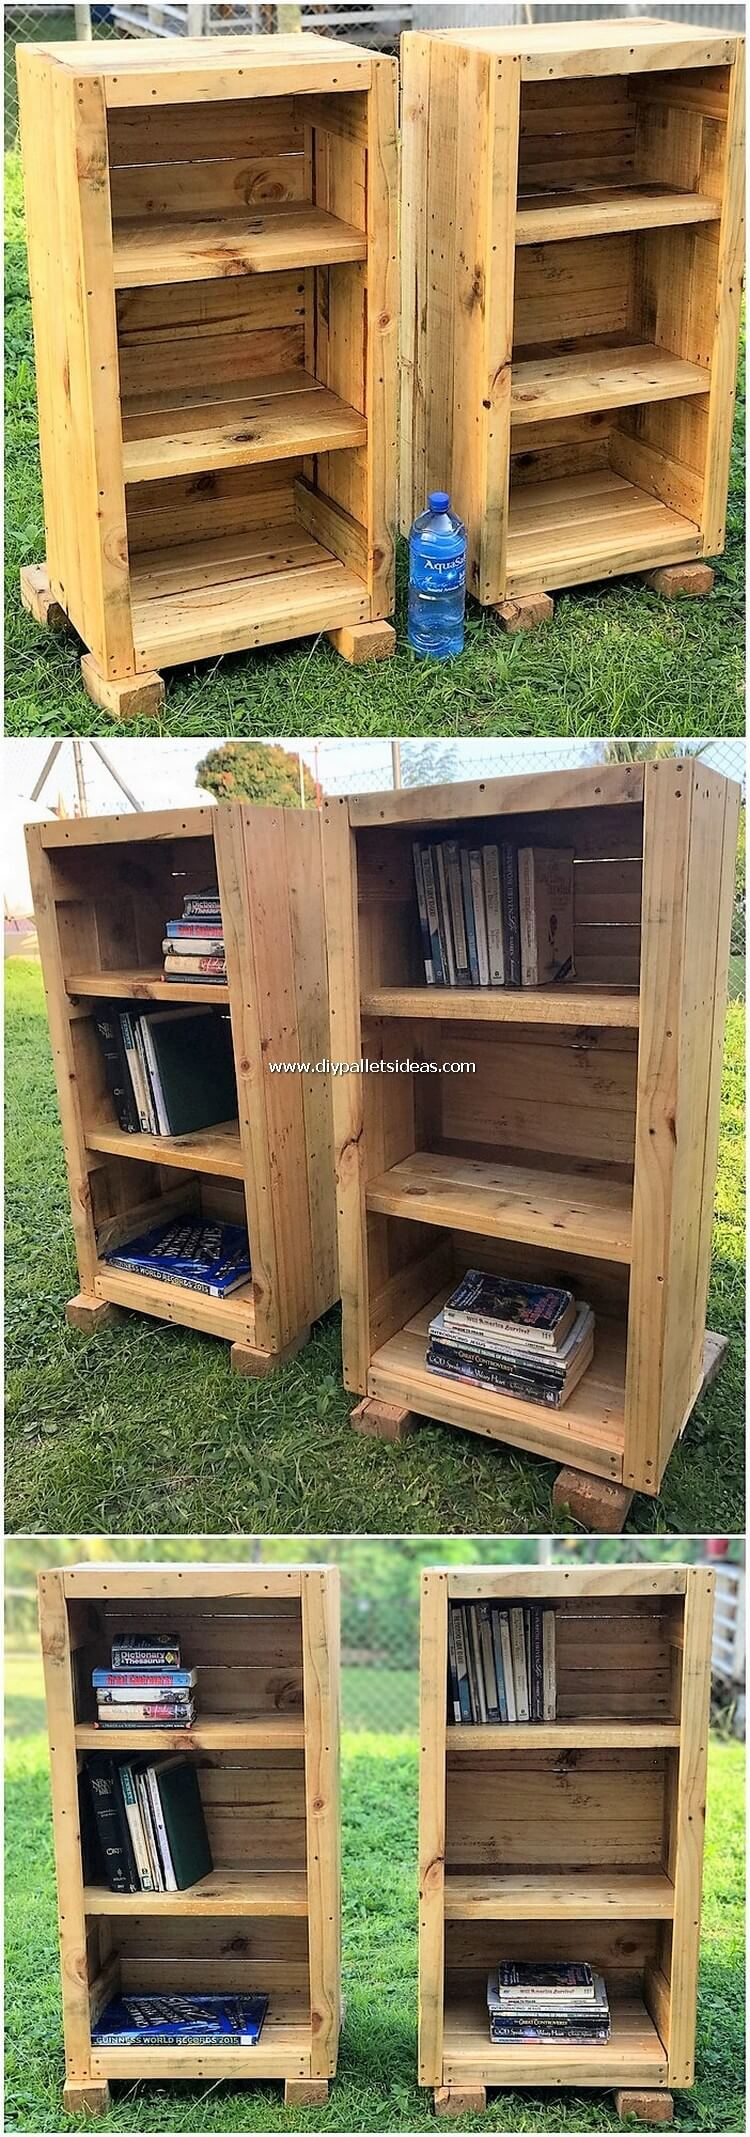 Pallet Bookshelving Cabinets